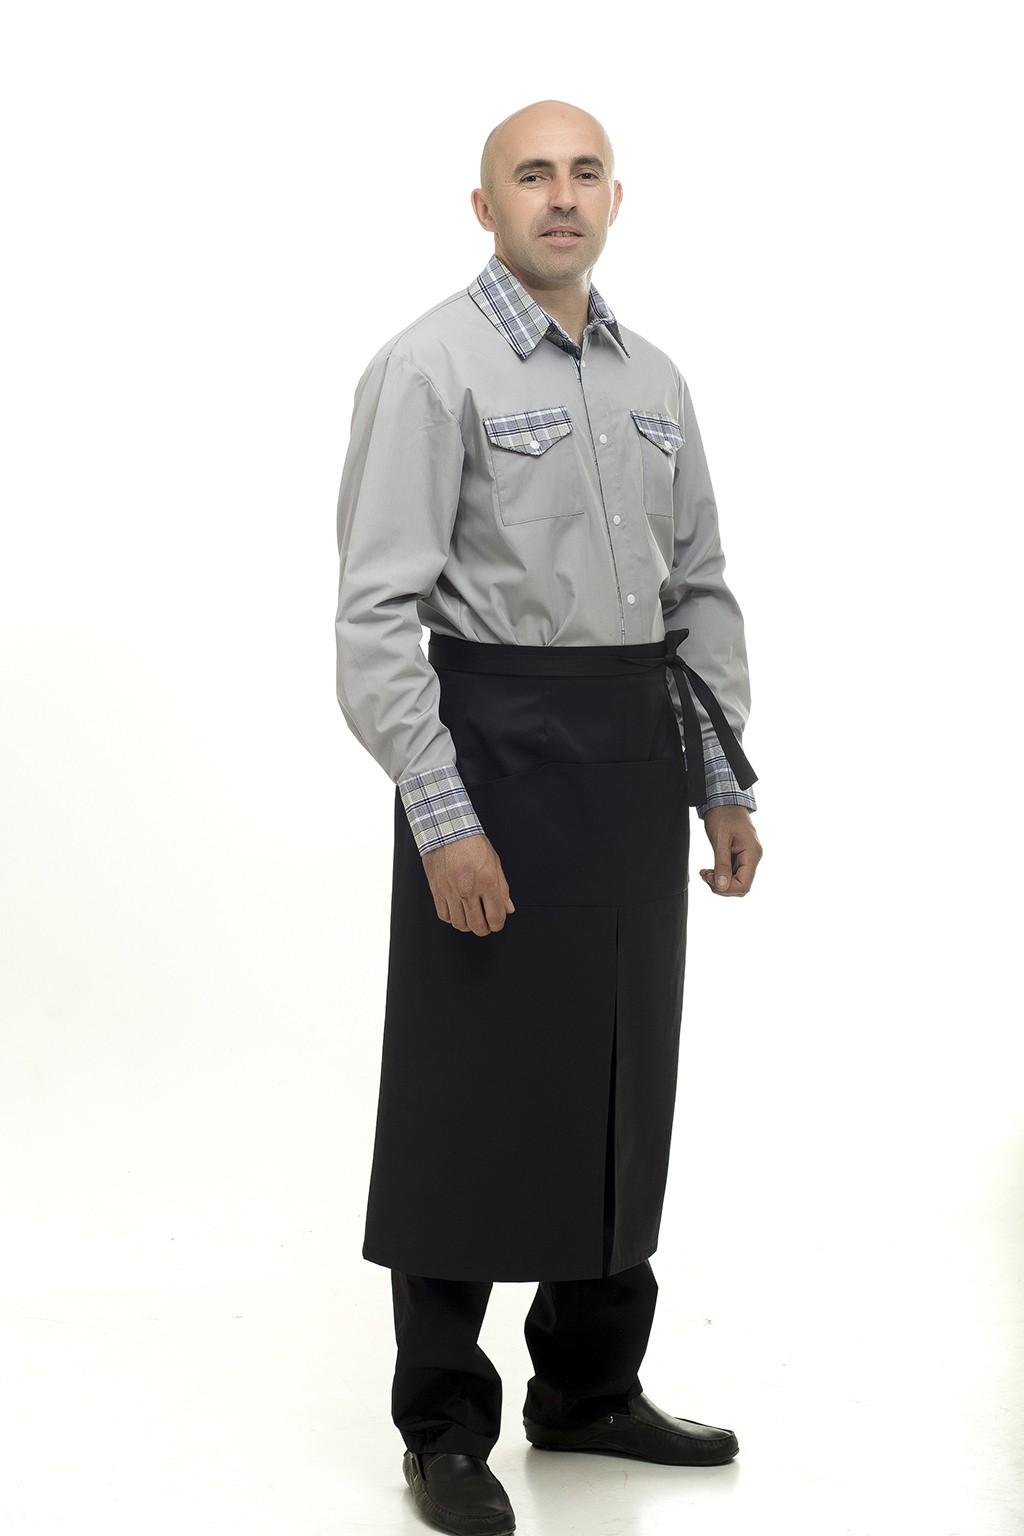 1819 Рубашка для официанта, бармена